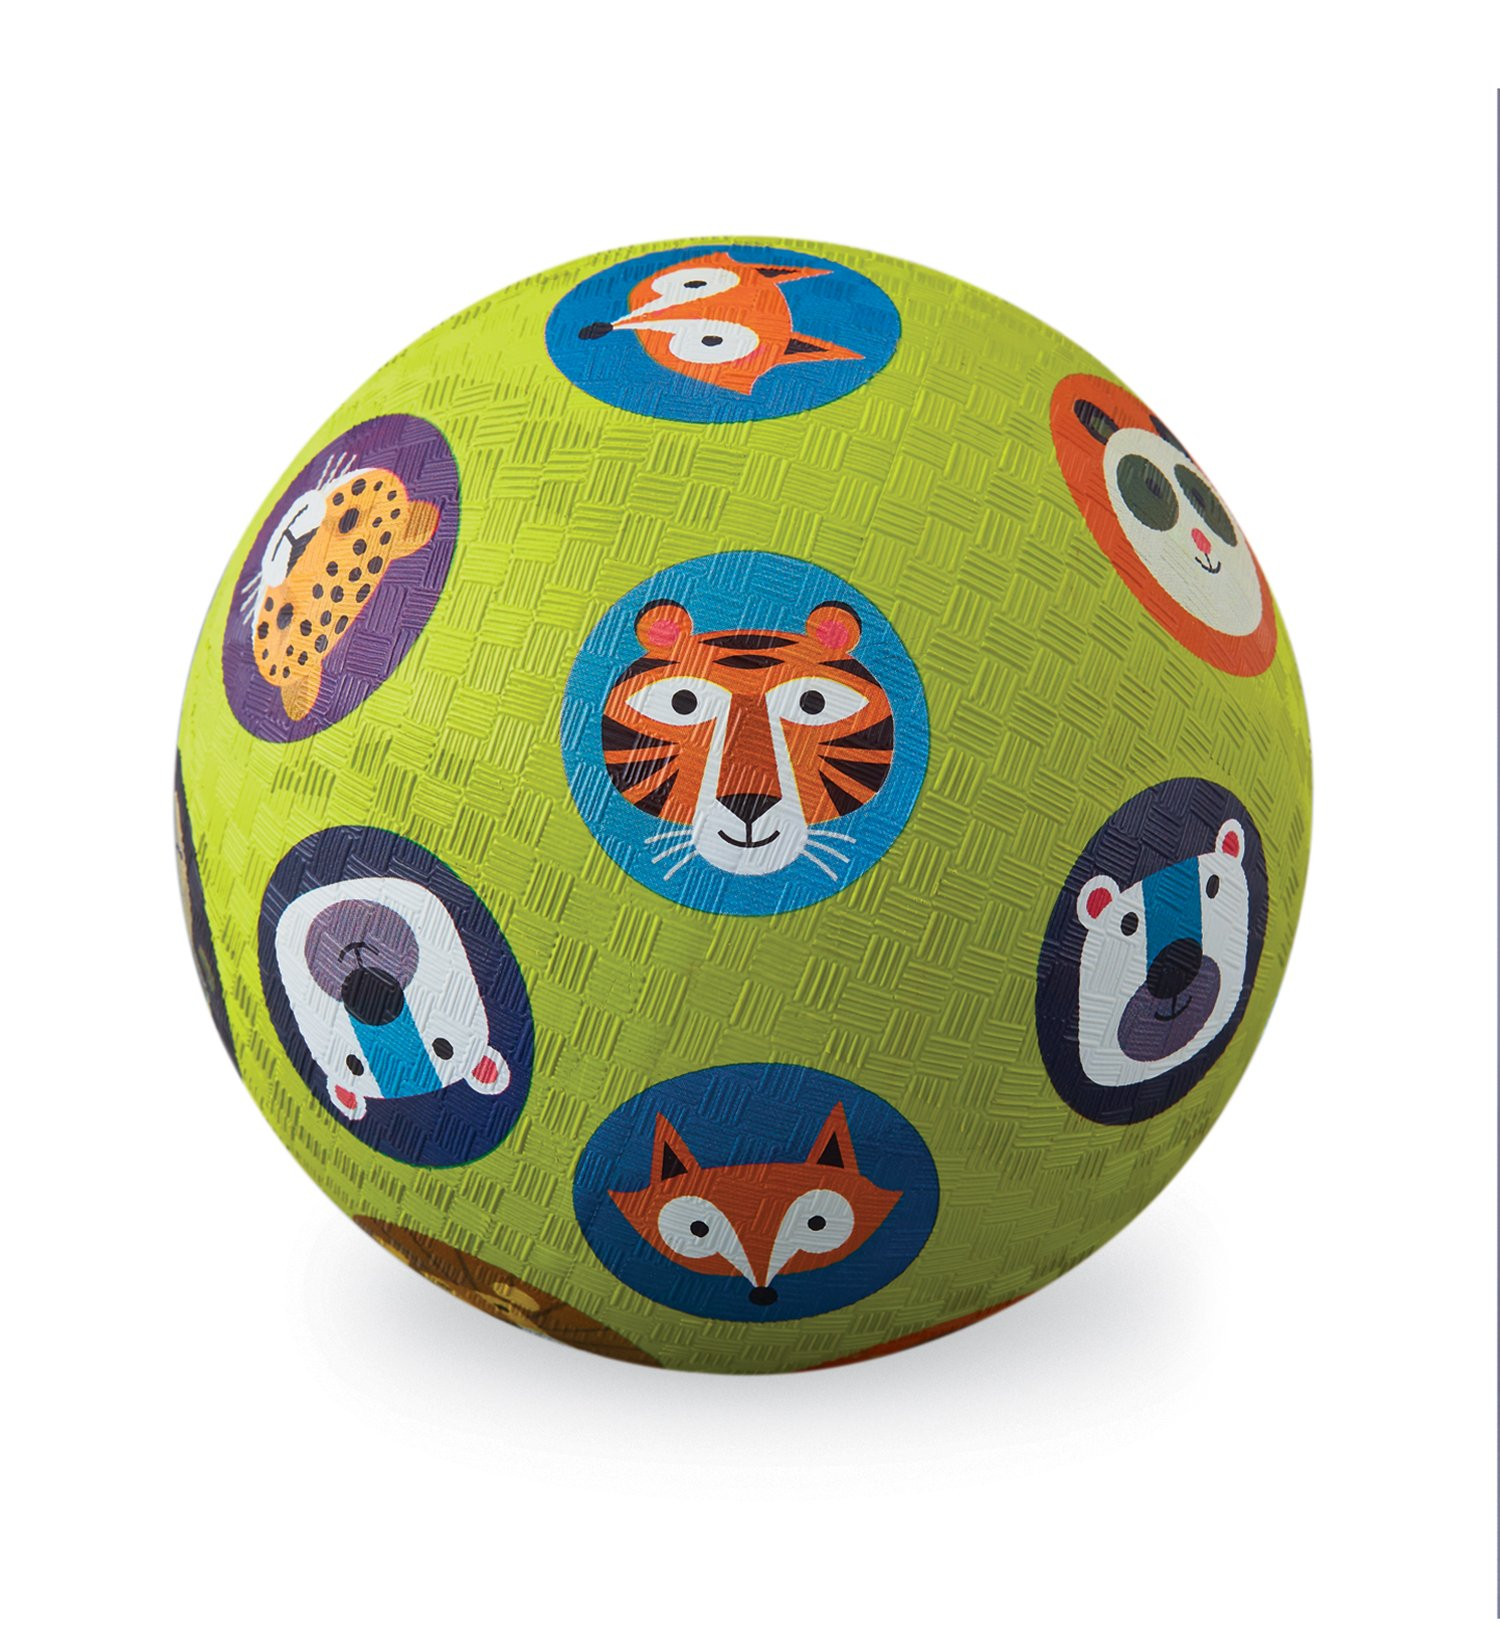 Earth toys. Balls clipart rubber ball